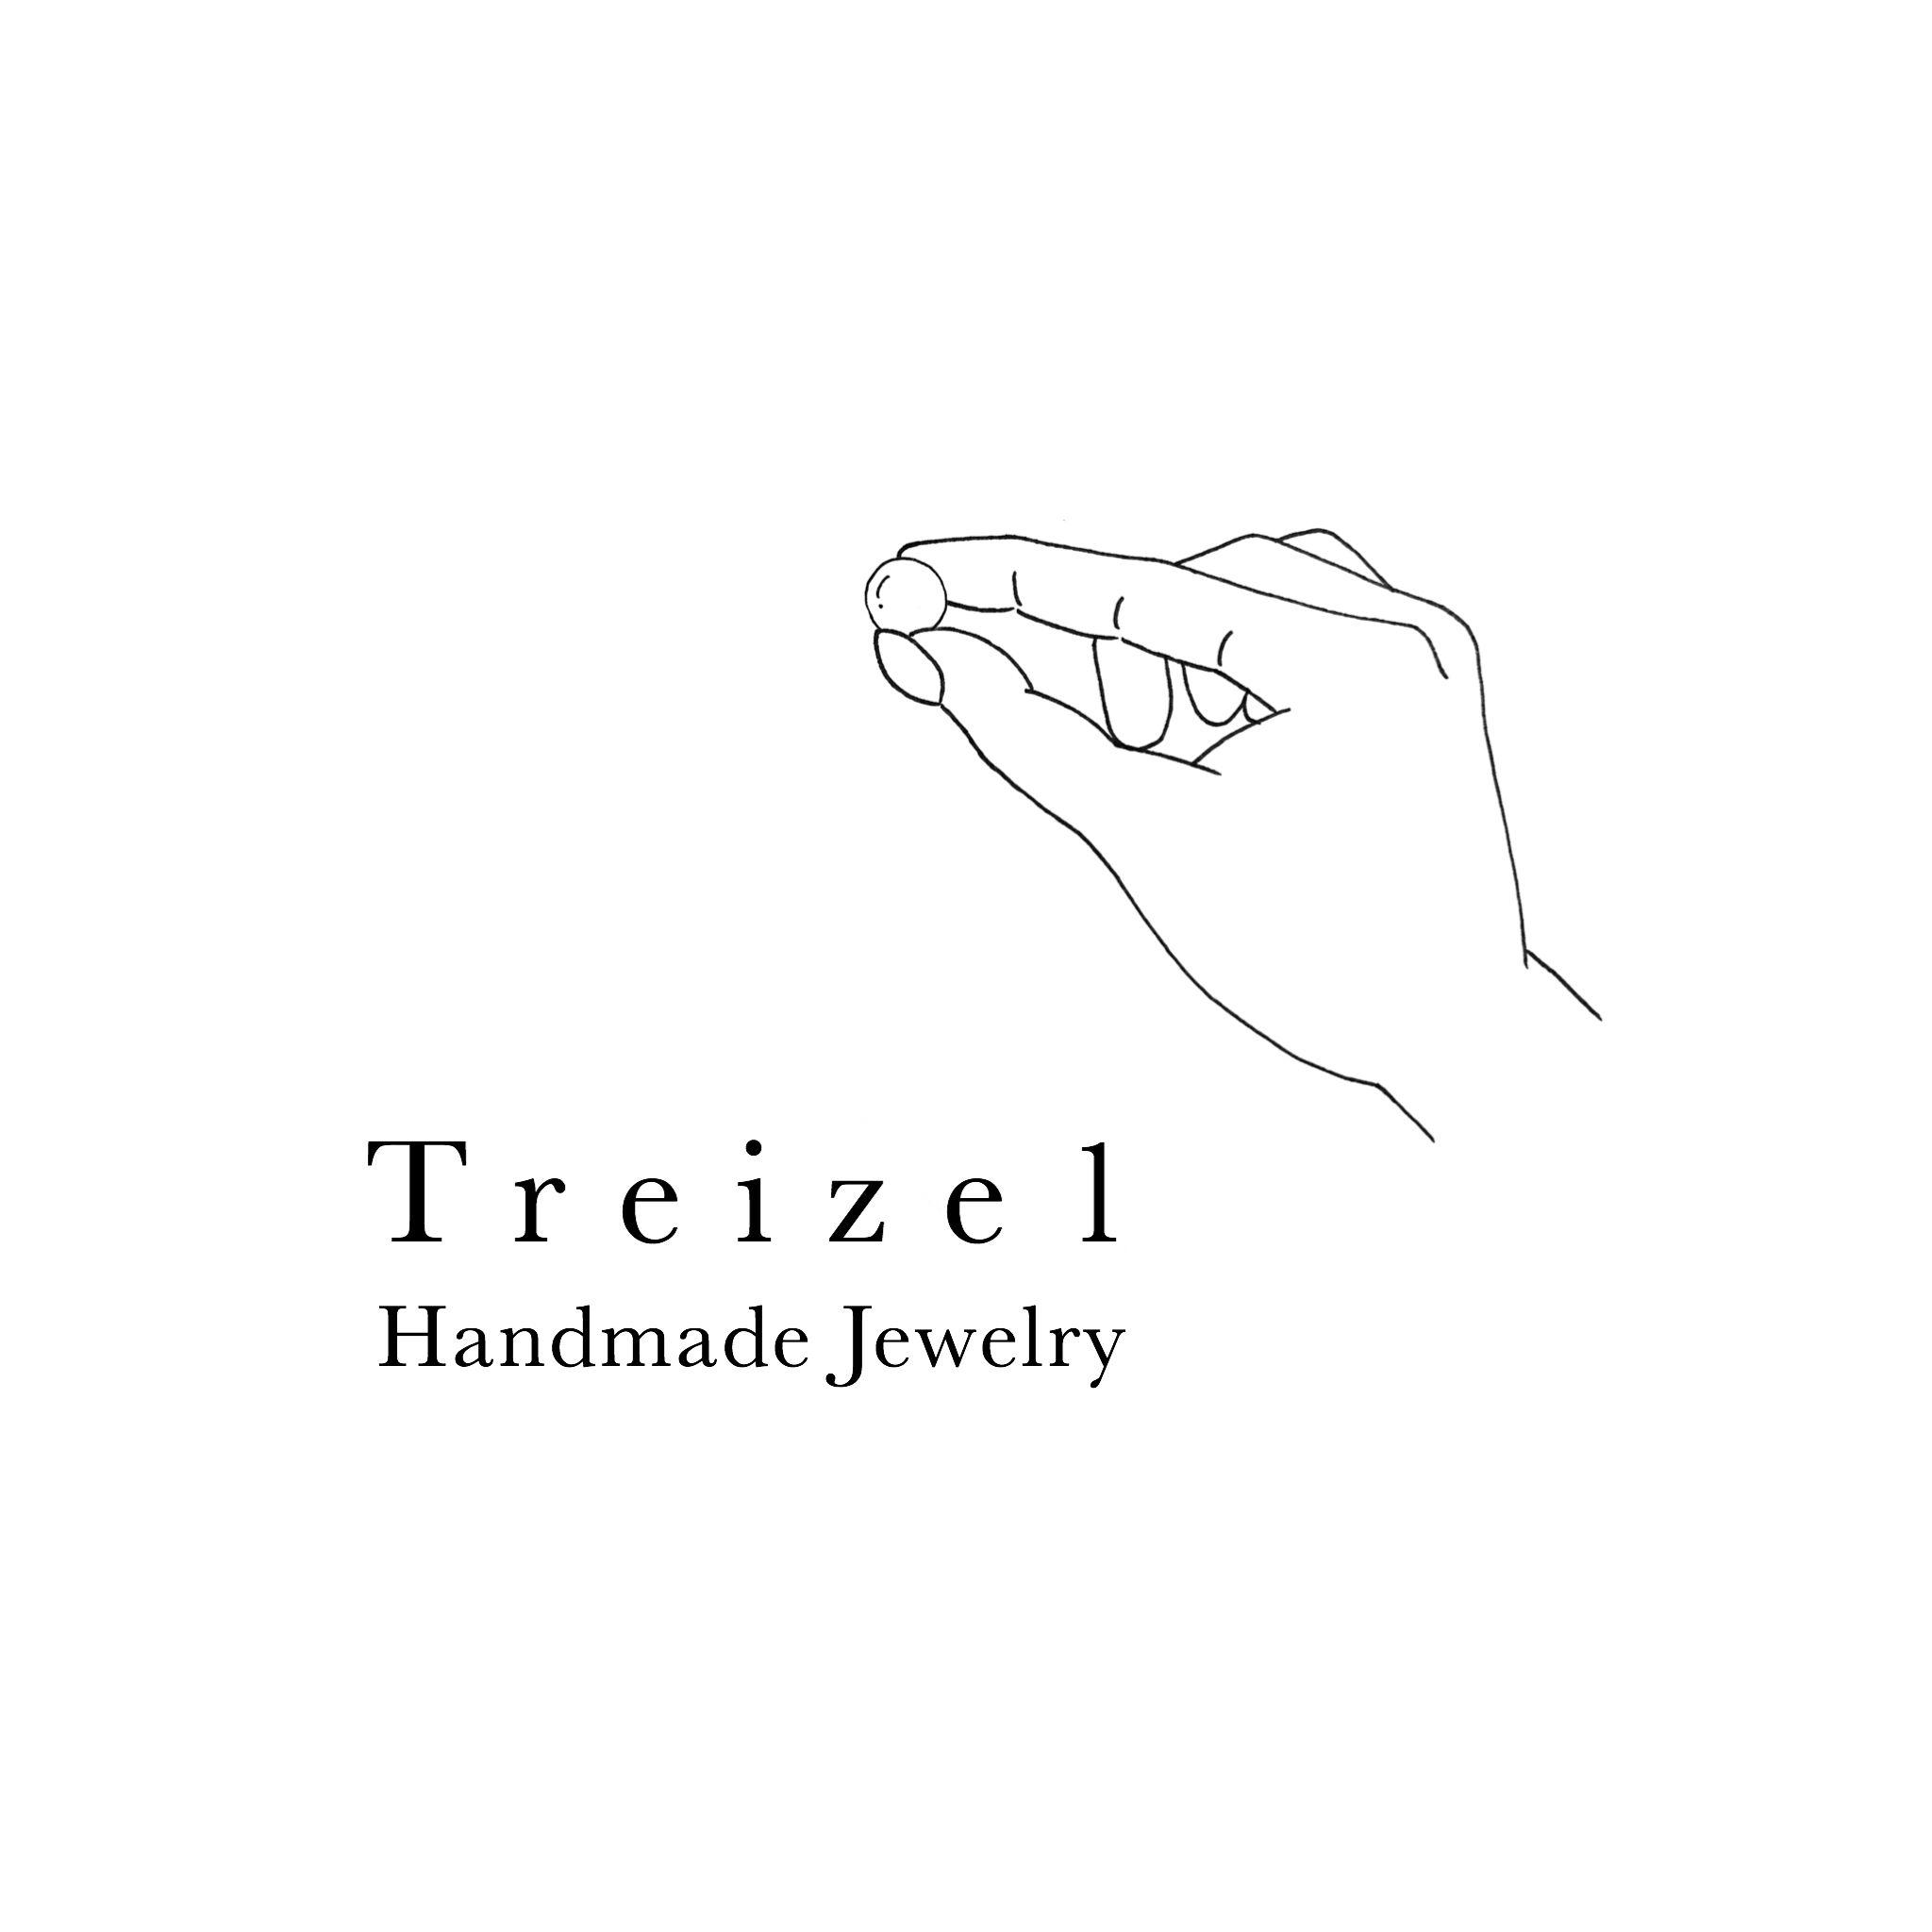 Treize1